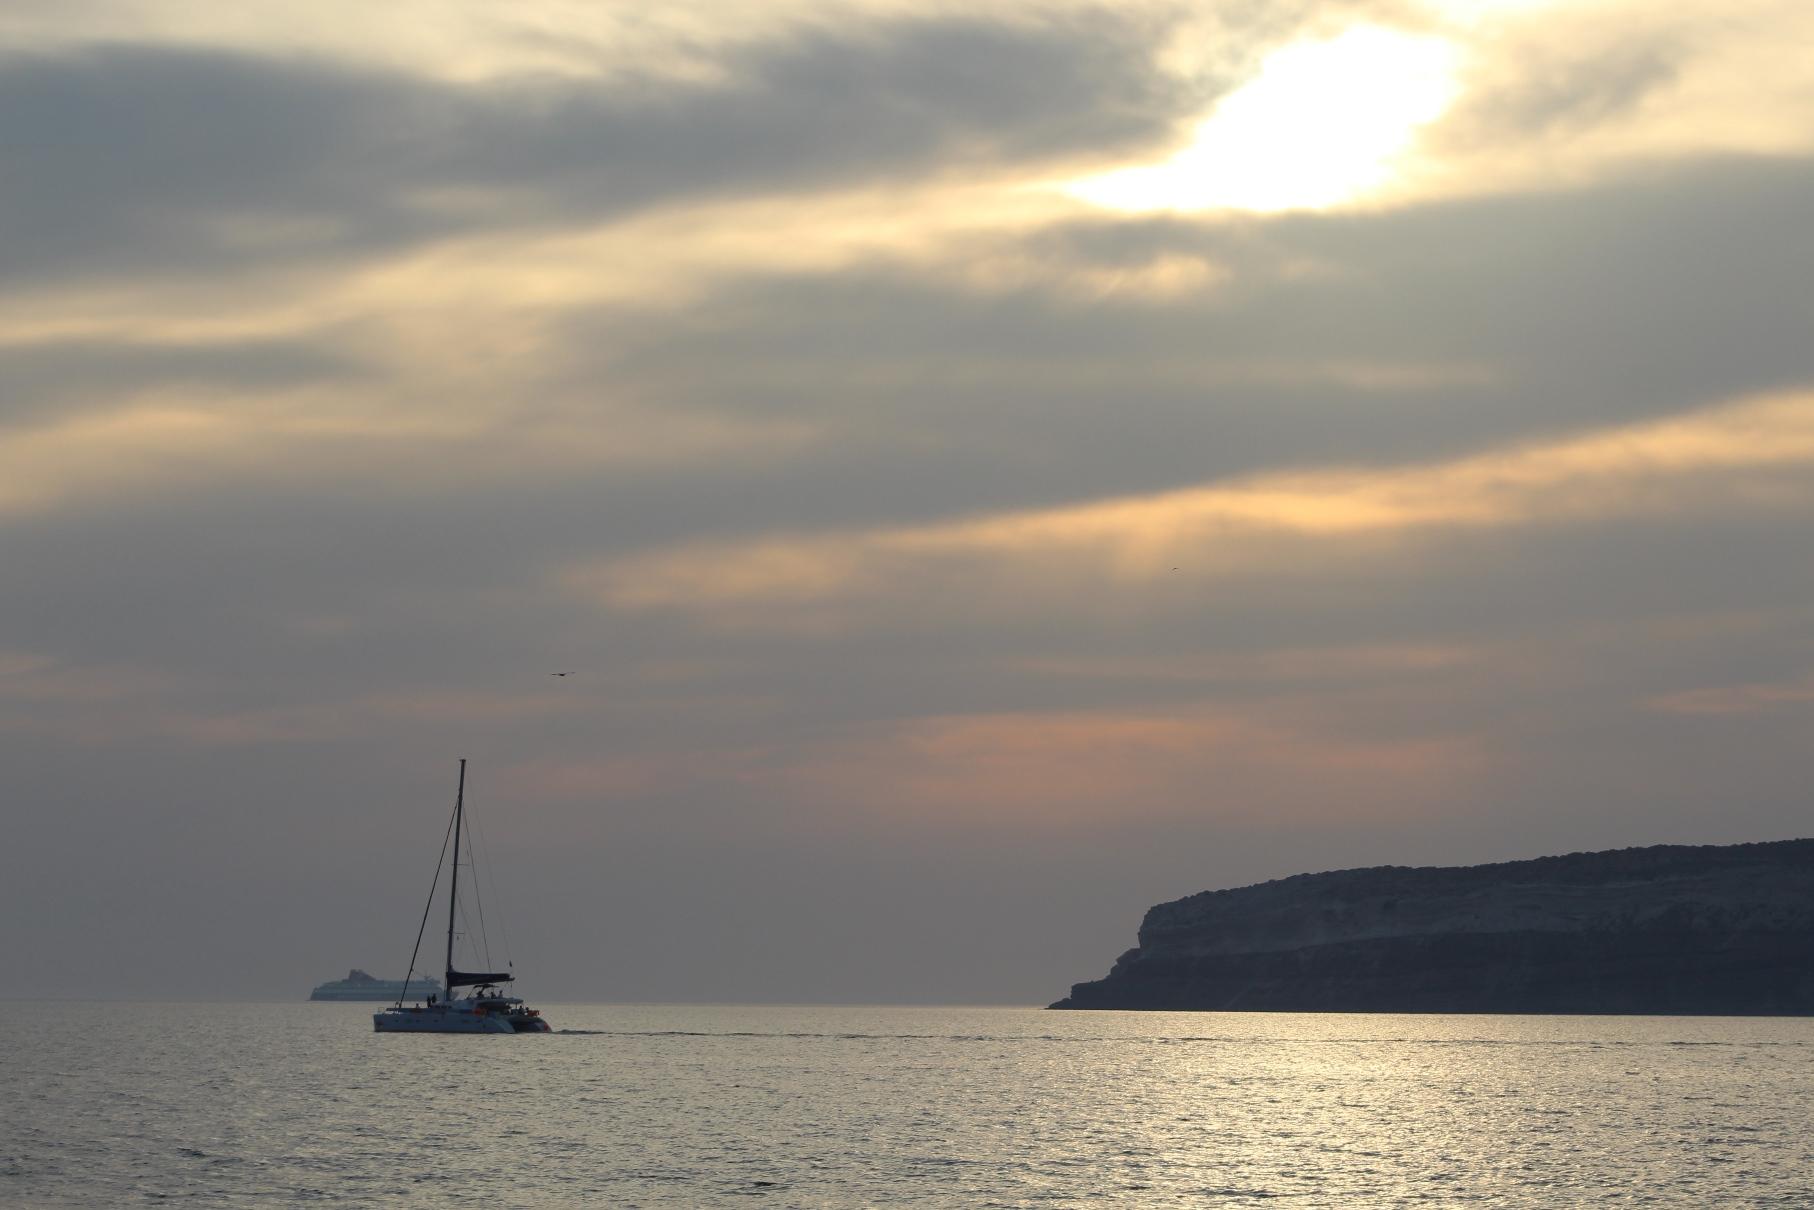 Last Minute Sunset Cruise a Highlight of Santorini Visit